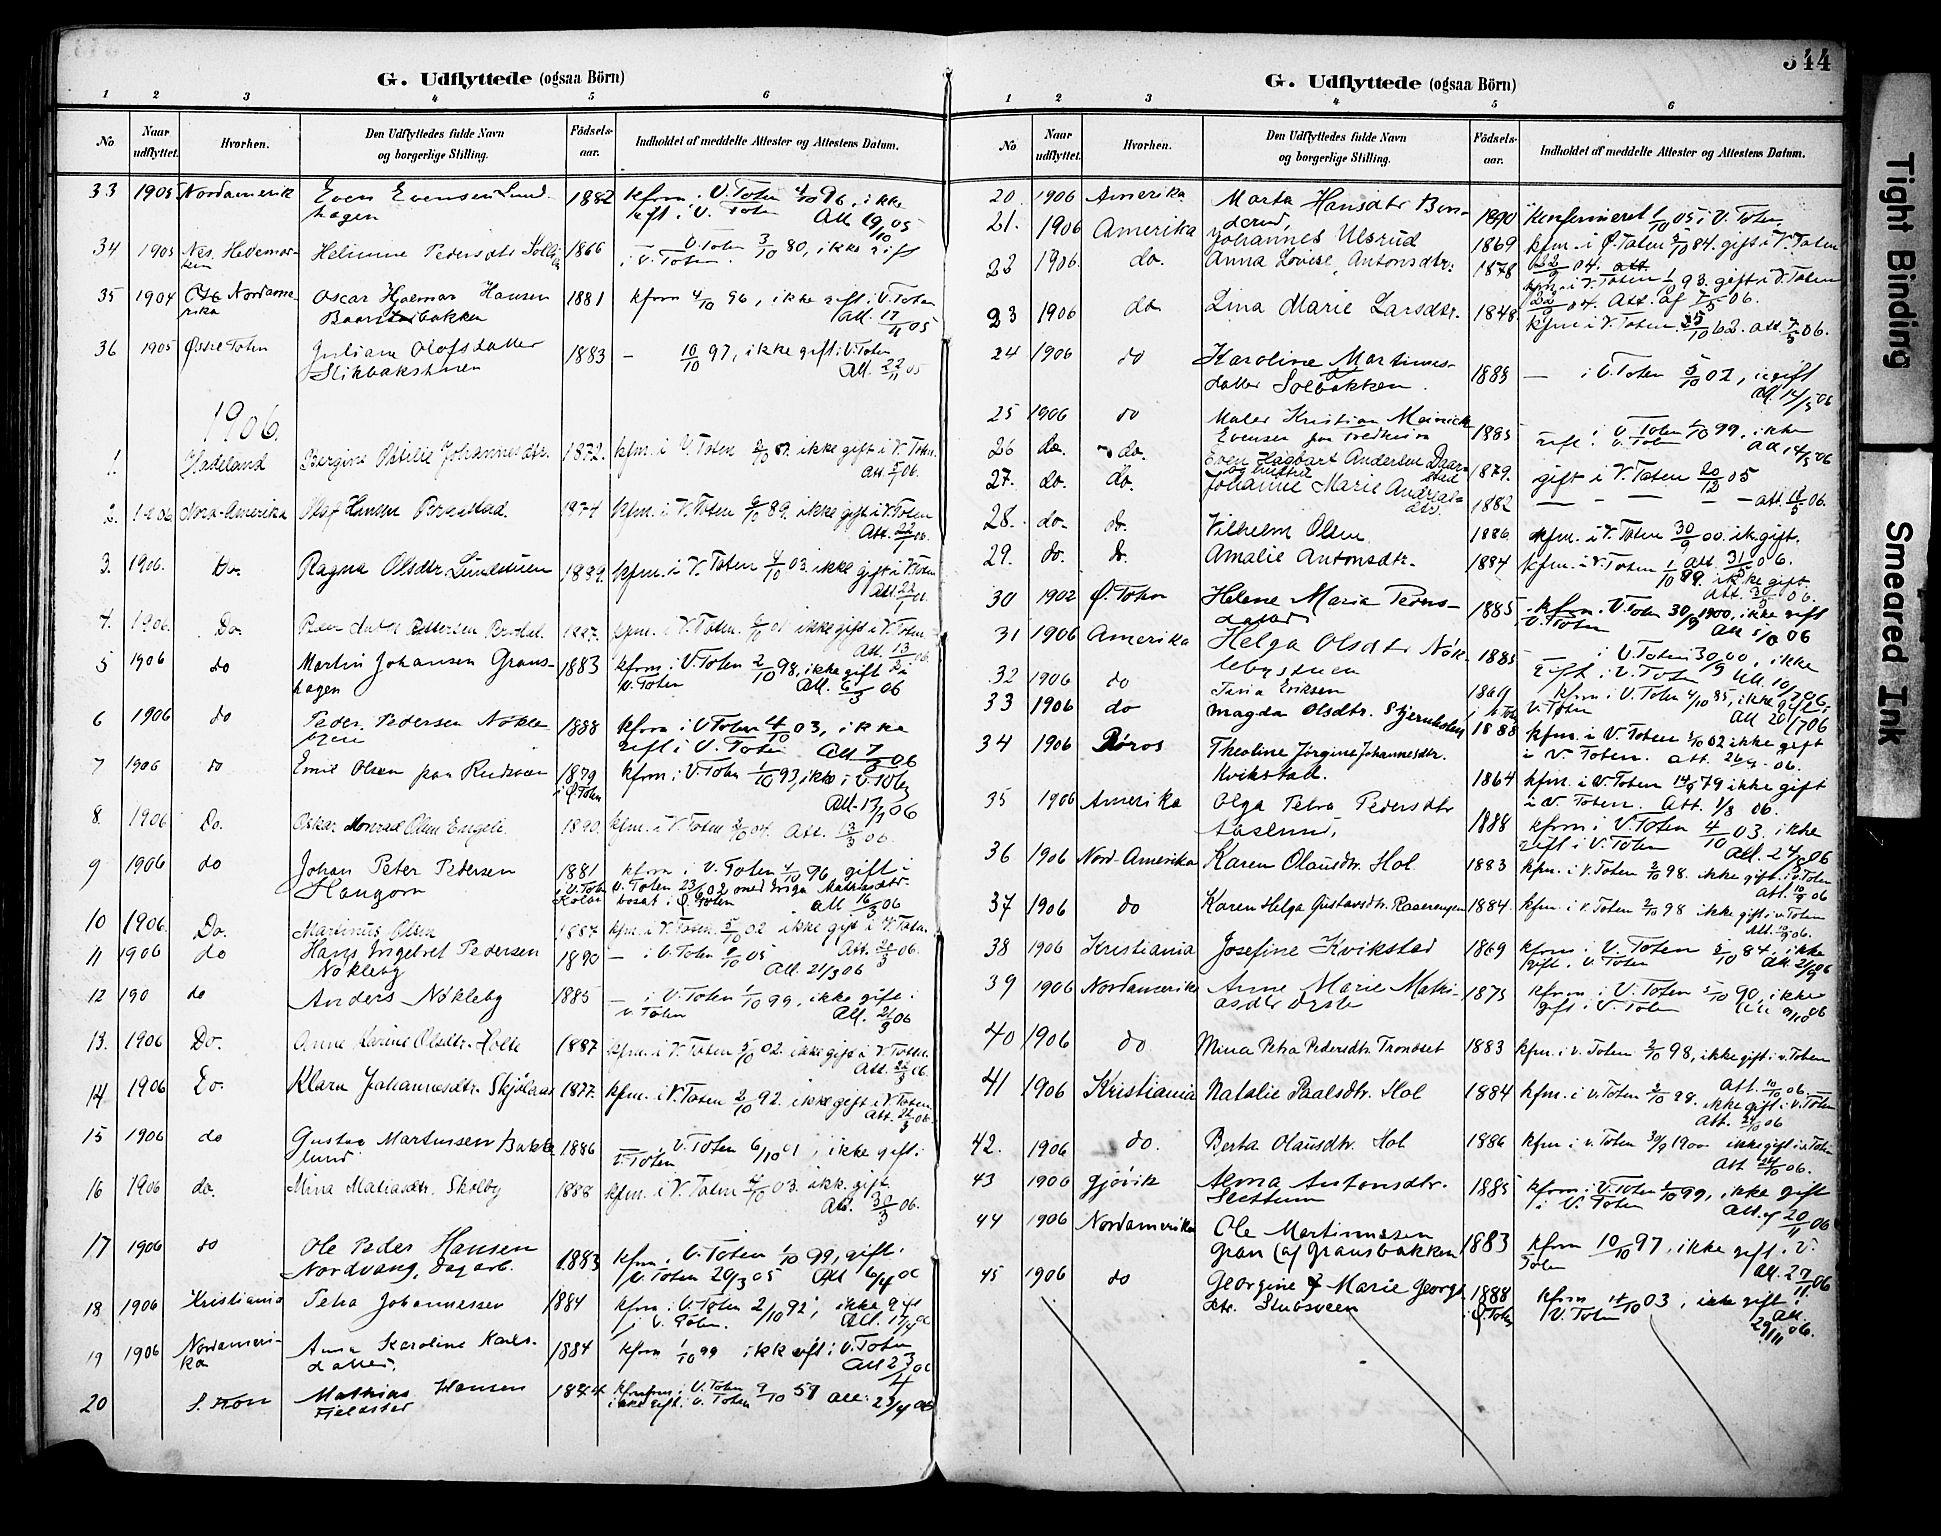 SAH, Vestre Toten prestekontor, H/Ha/Haa/L0013: Ministerialbok nr. 13, 1895-1911, s. 344